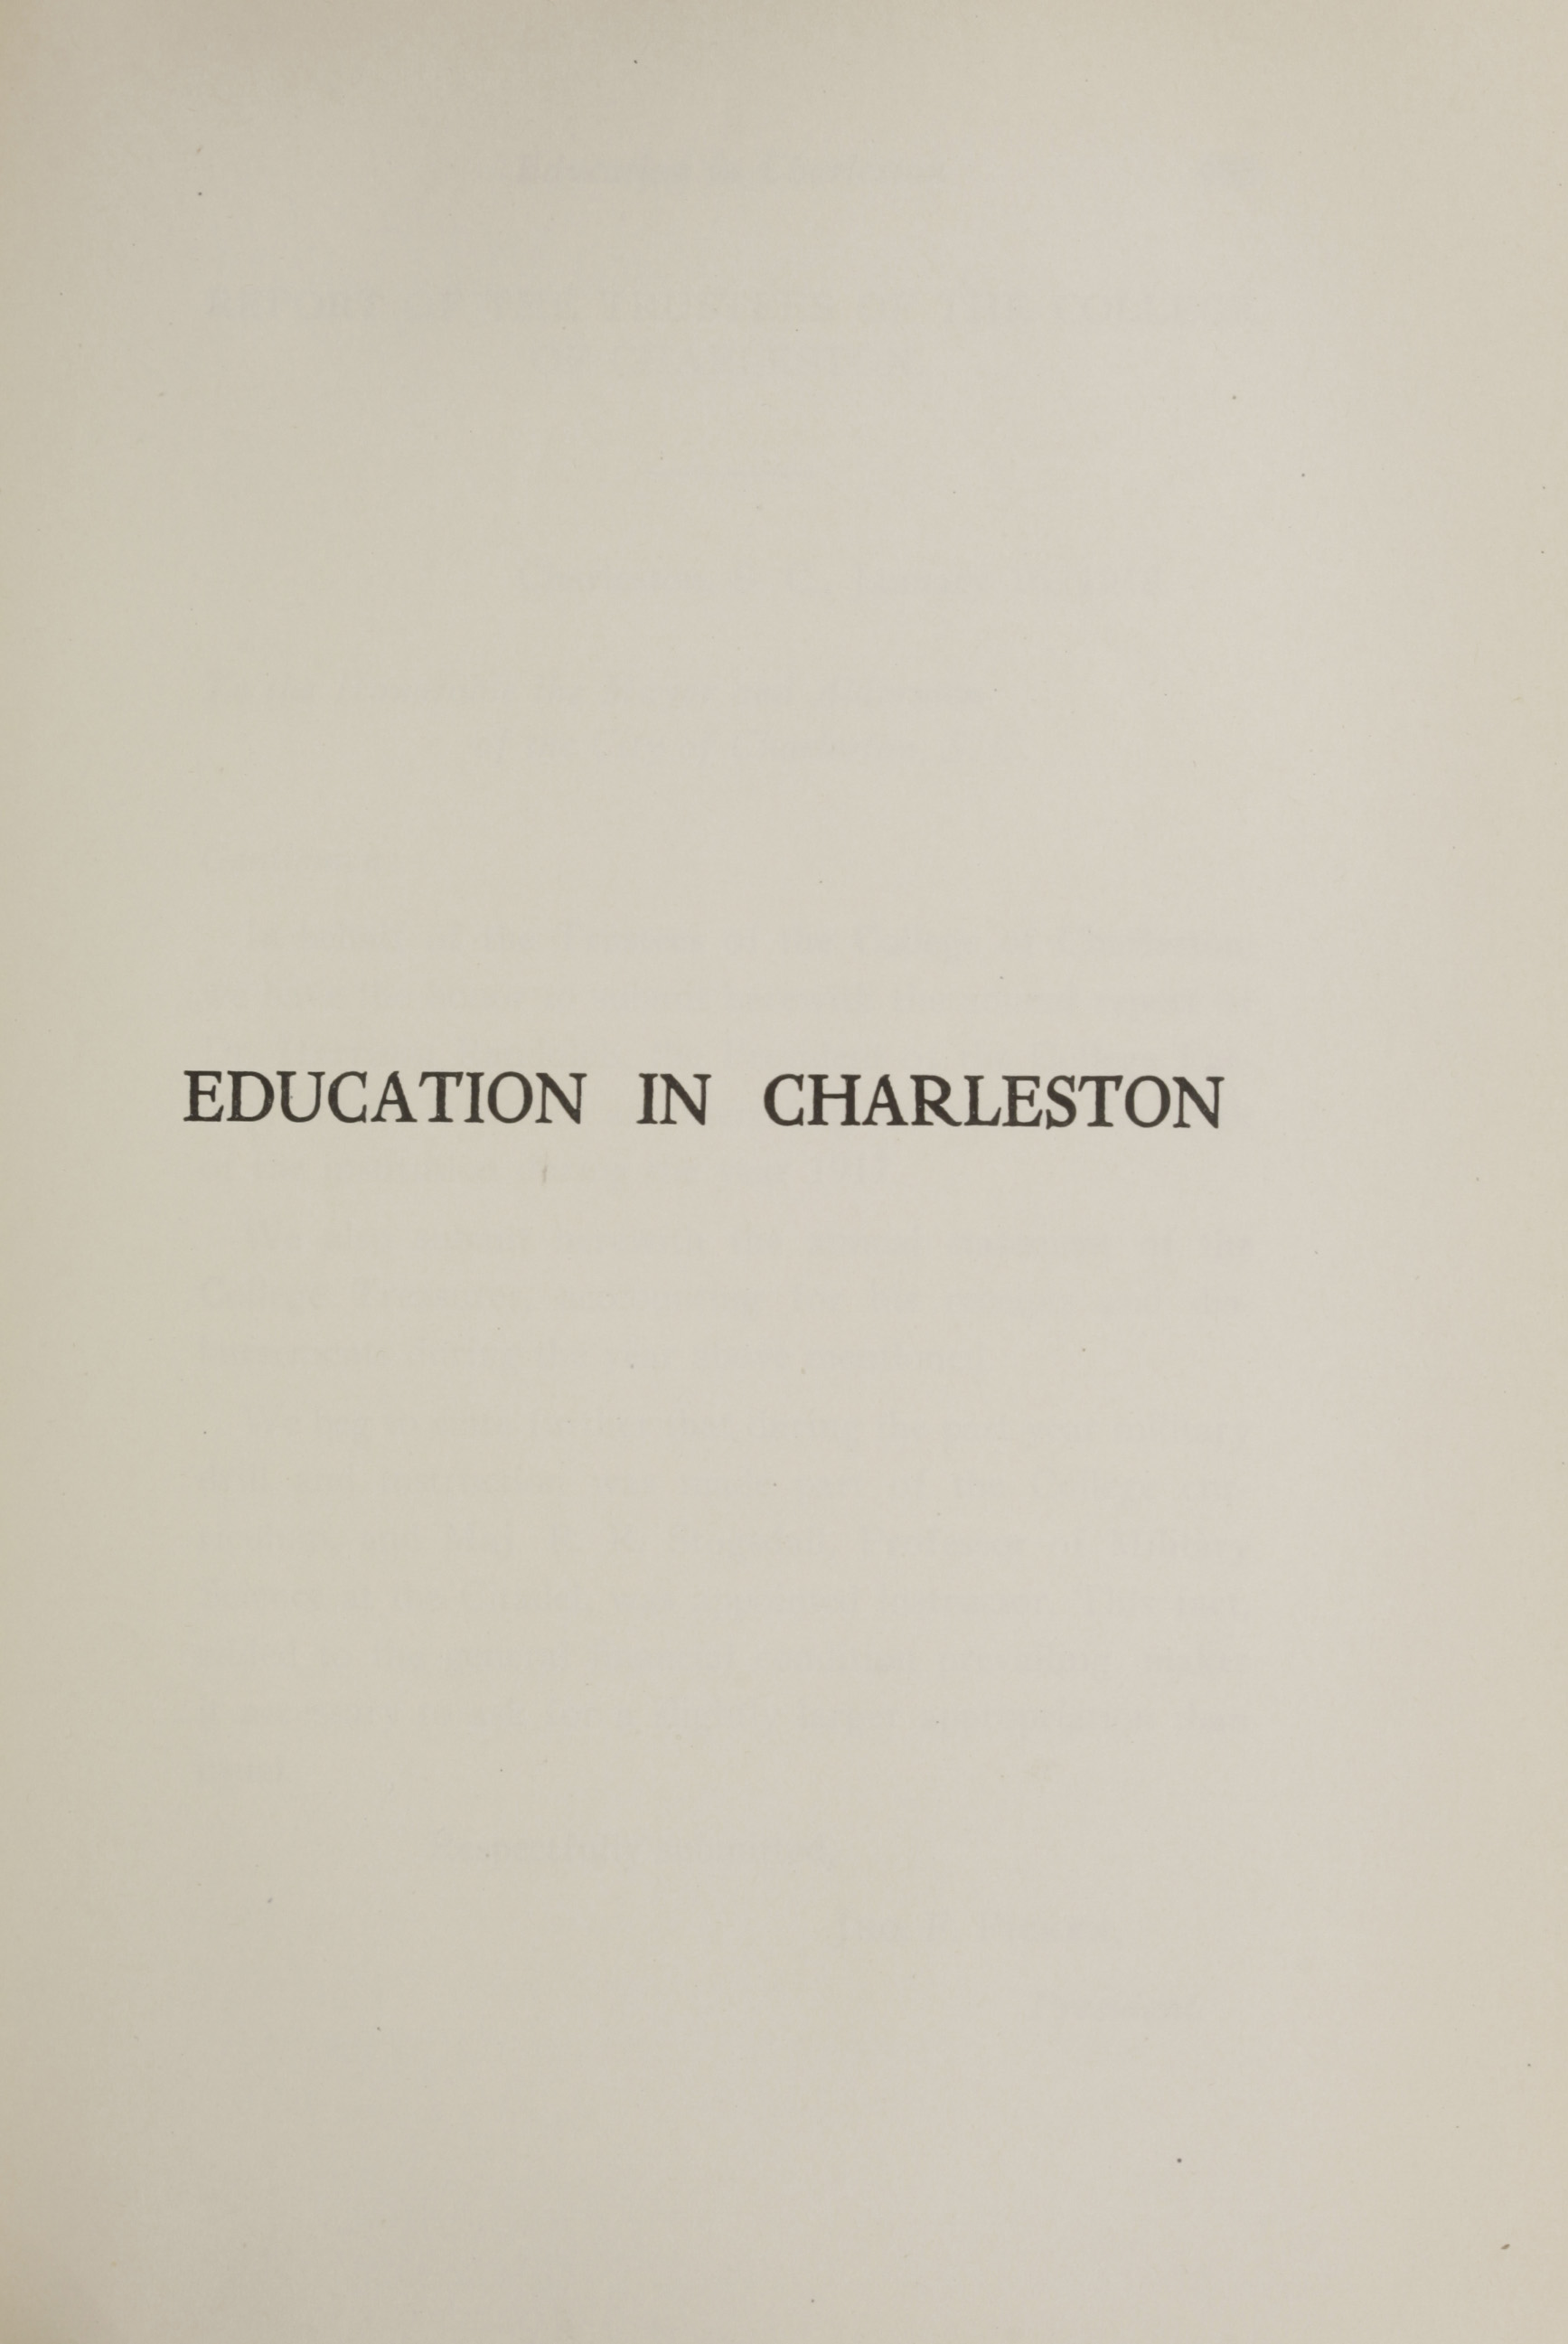 Charleston Yearbook, 1917, page 483